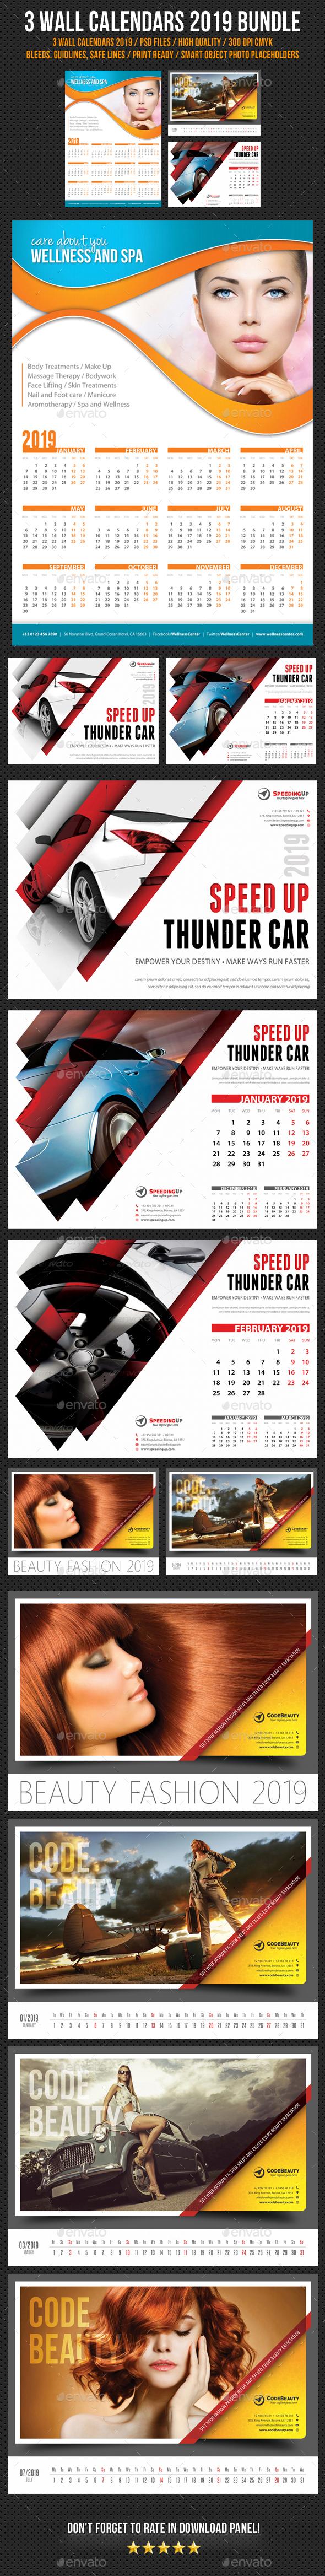 Wall Calendars 2019 Bundle V04 - Calendars Stationery